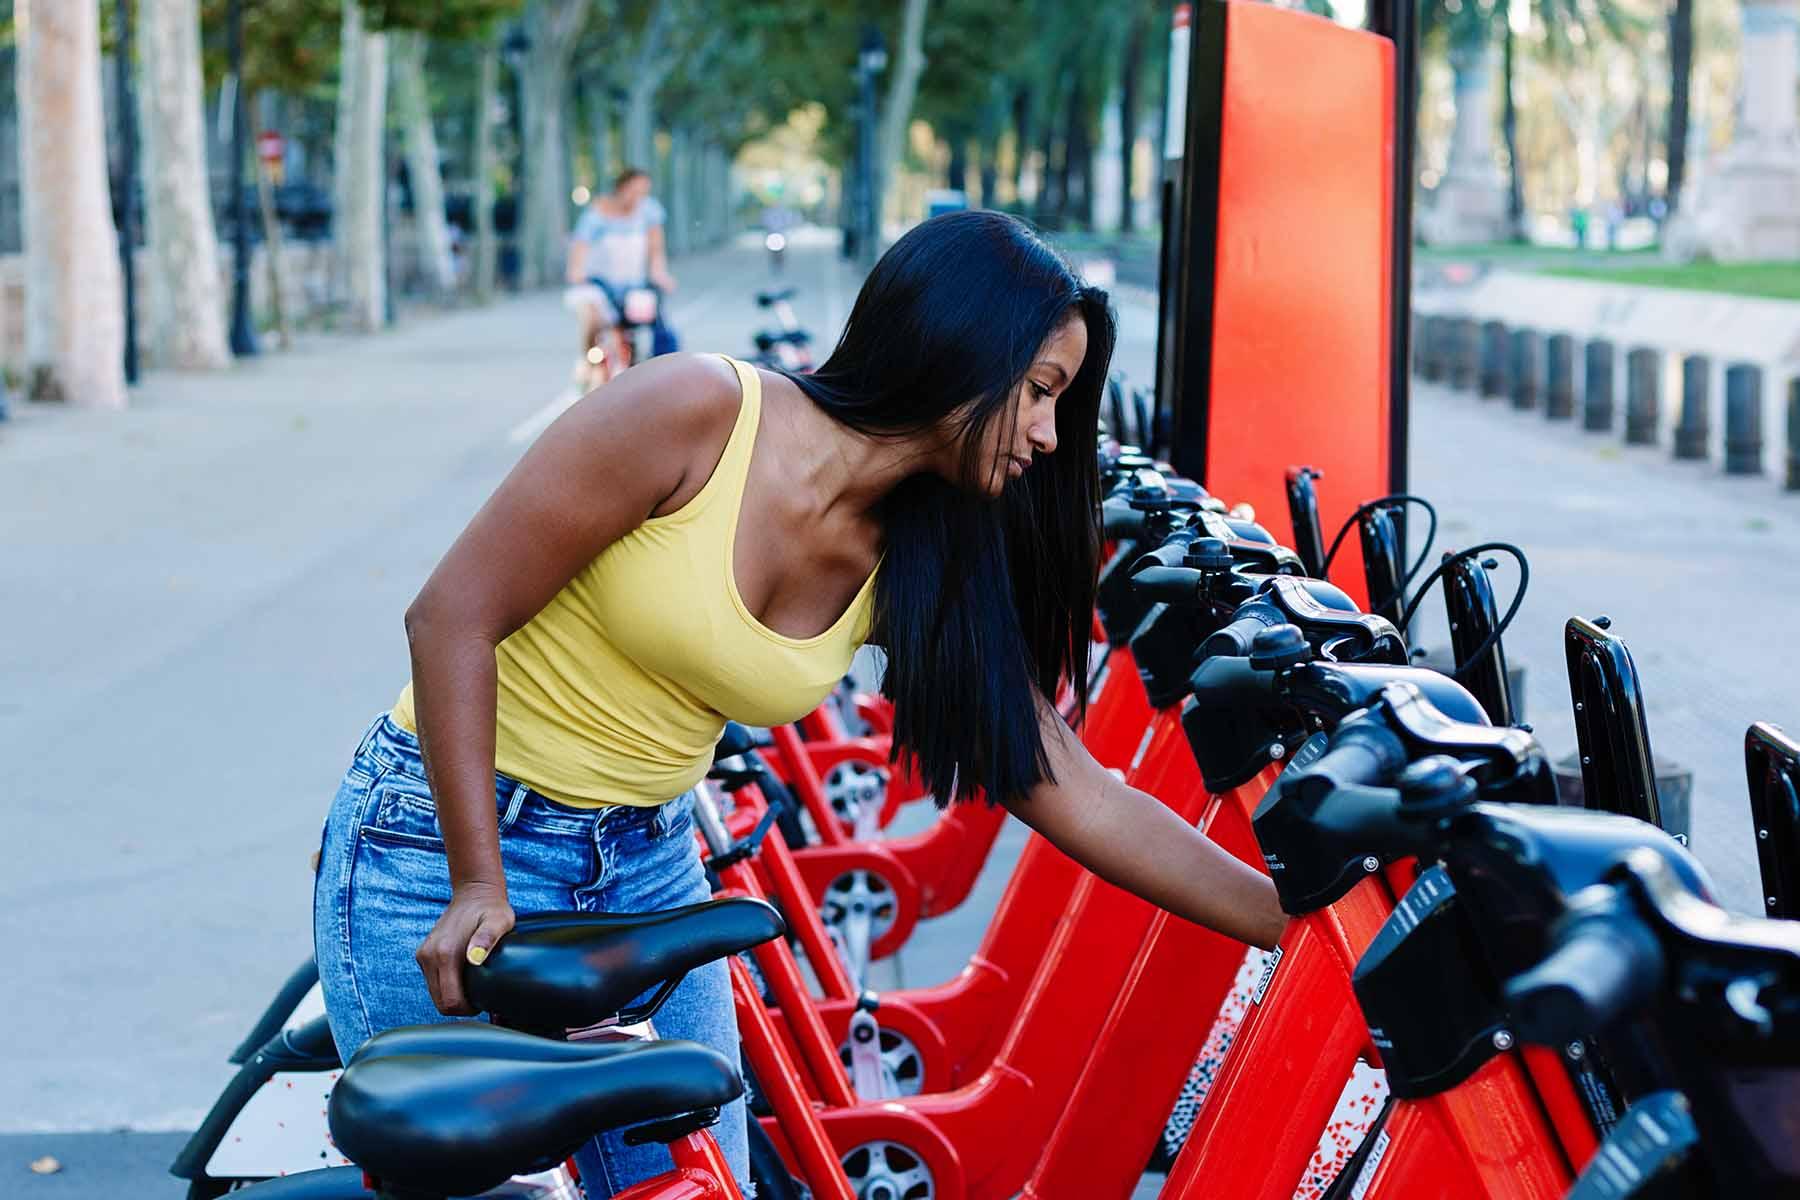 Young woman taking a rental bike